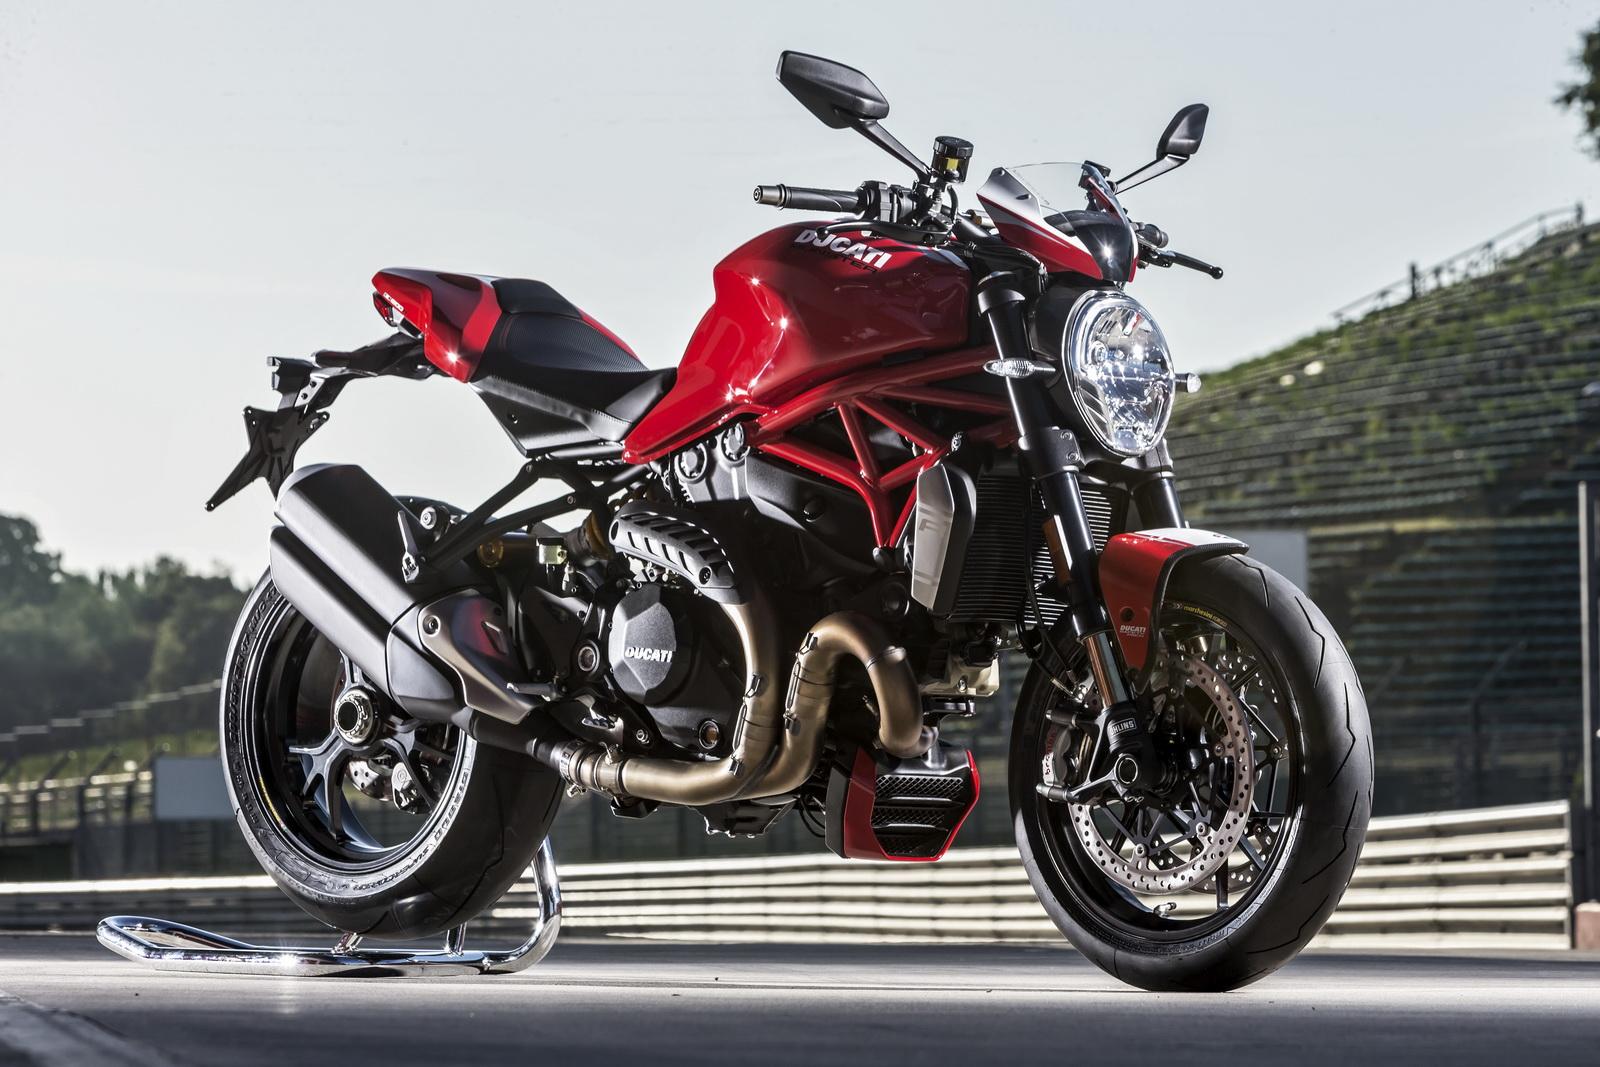 Ducati Monster 1200 R 6